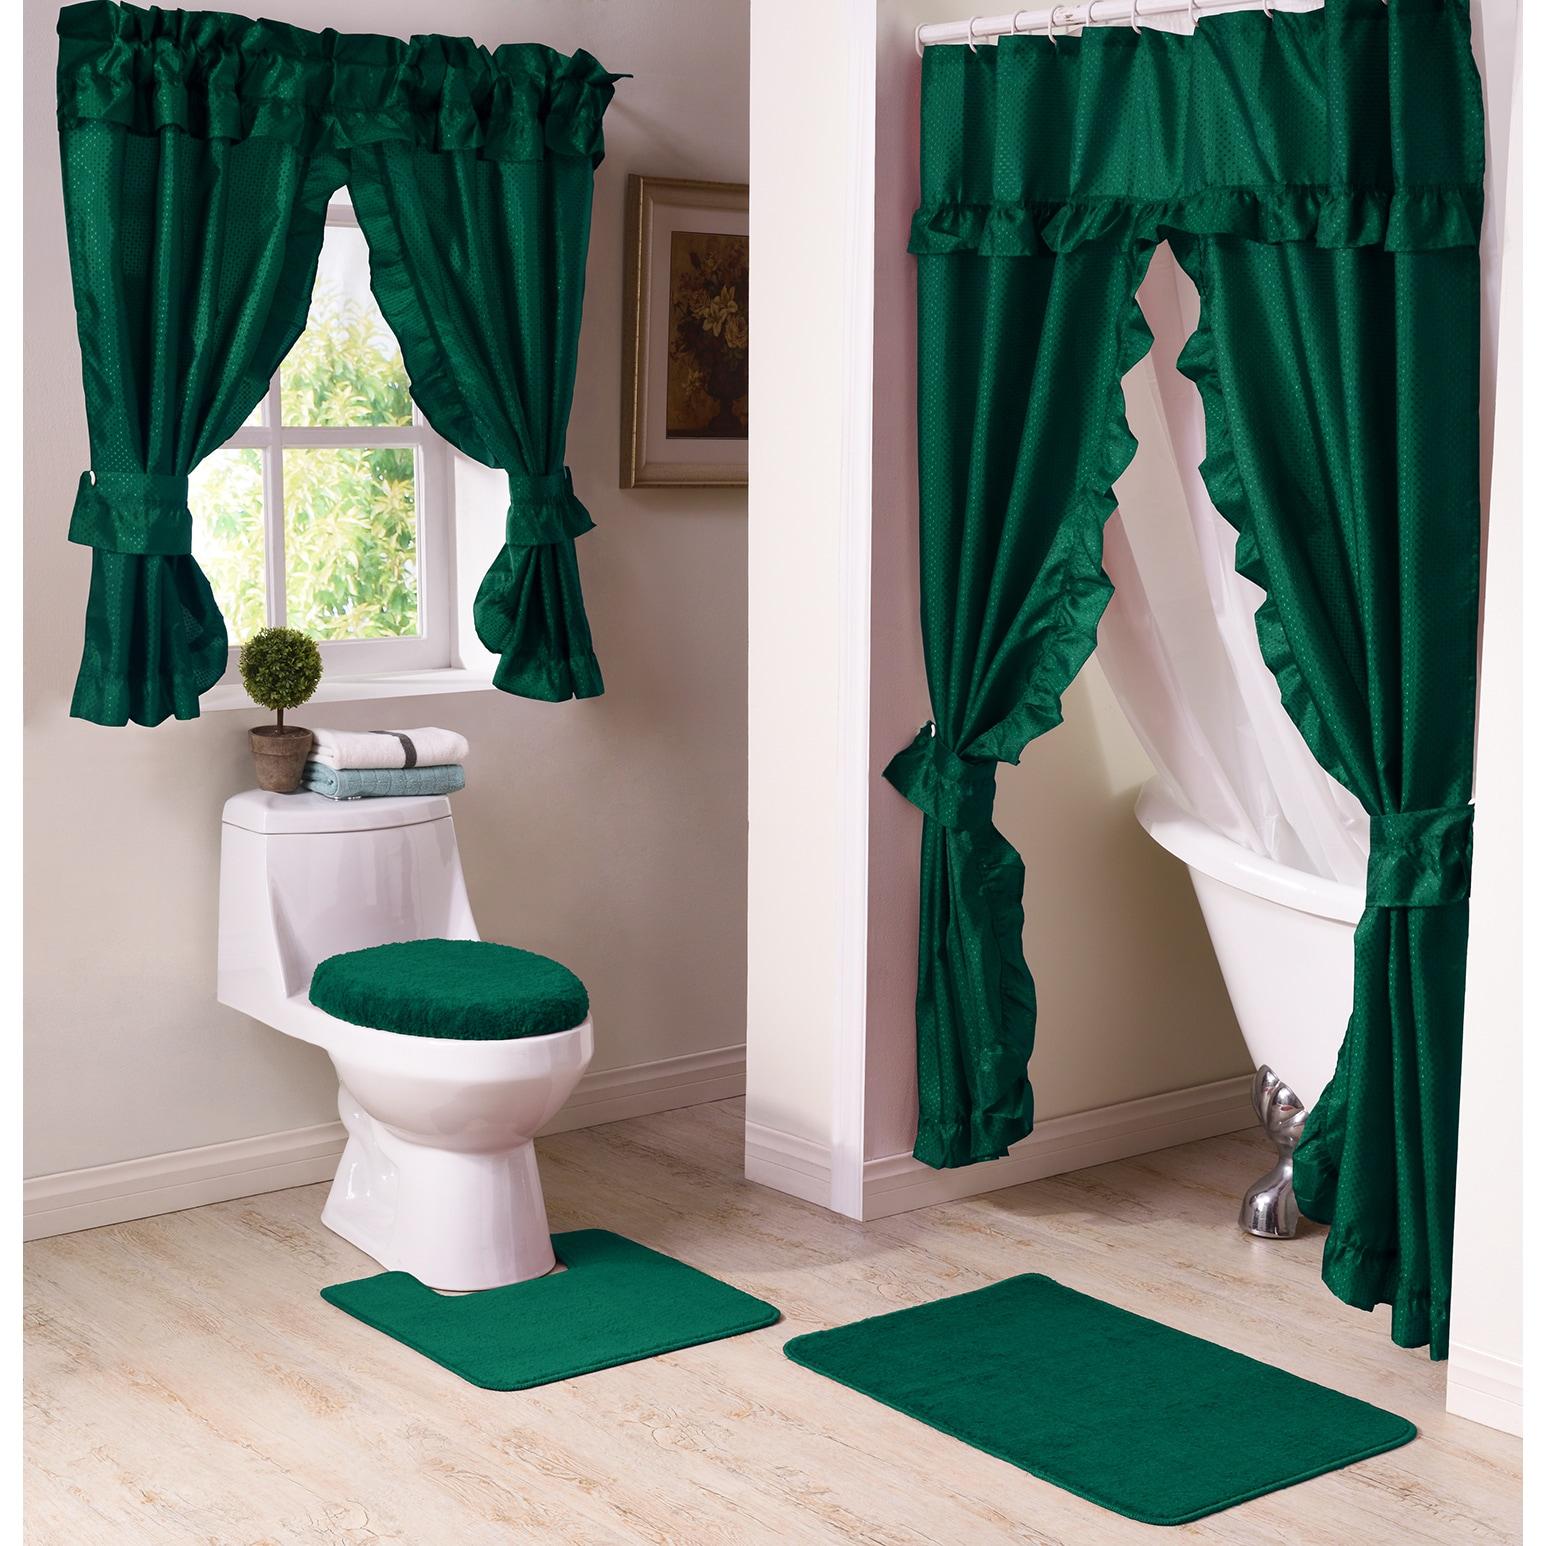 Shop Starlite 11 Piece Shower Curtain and Window Curtain Bath Set